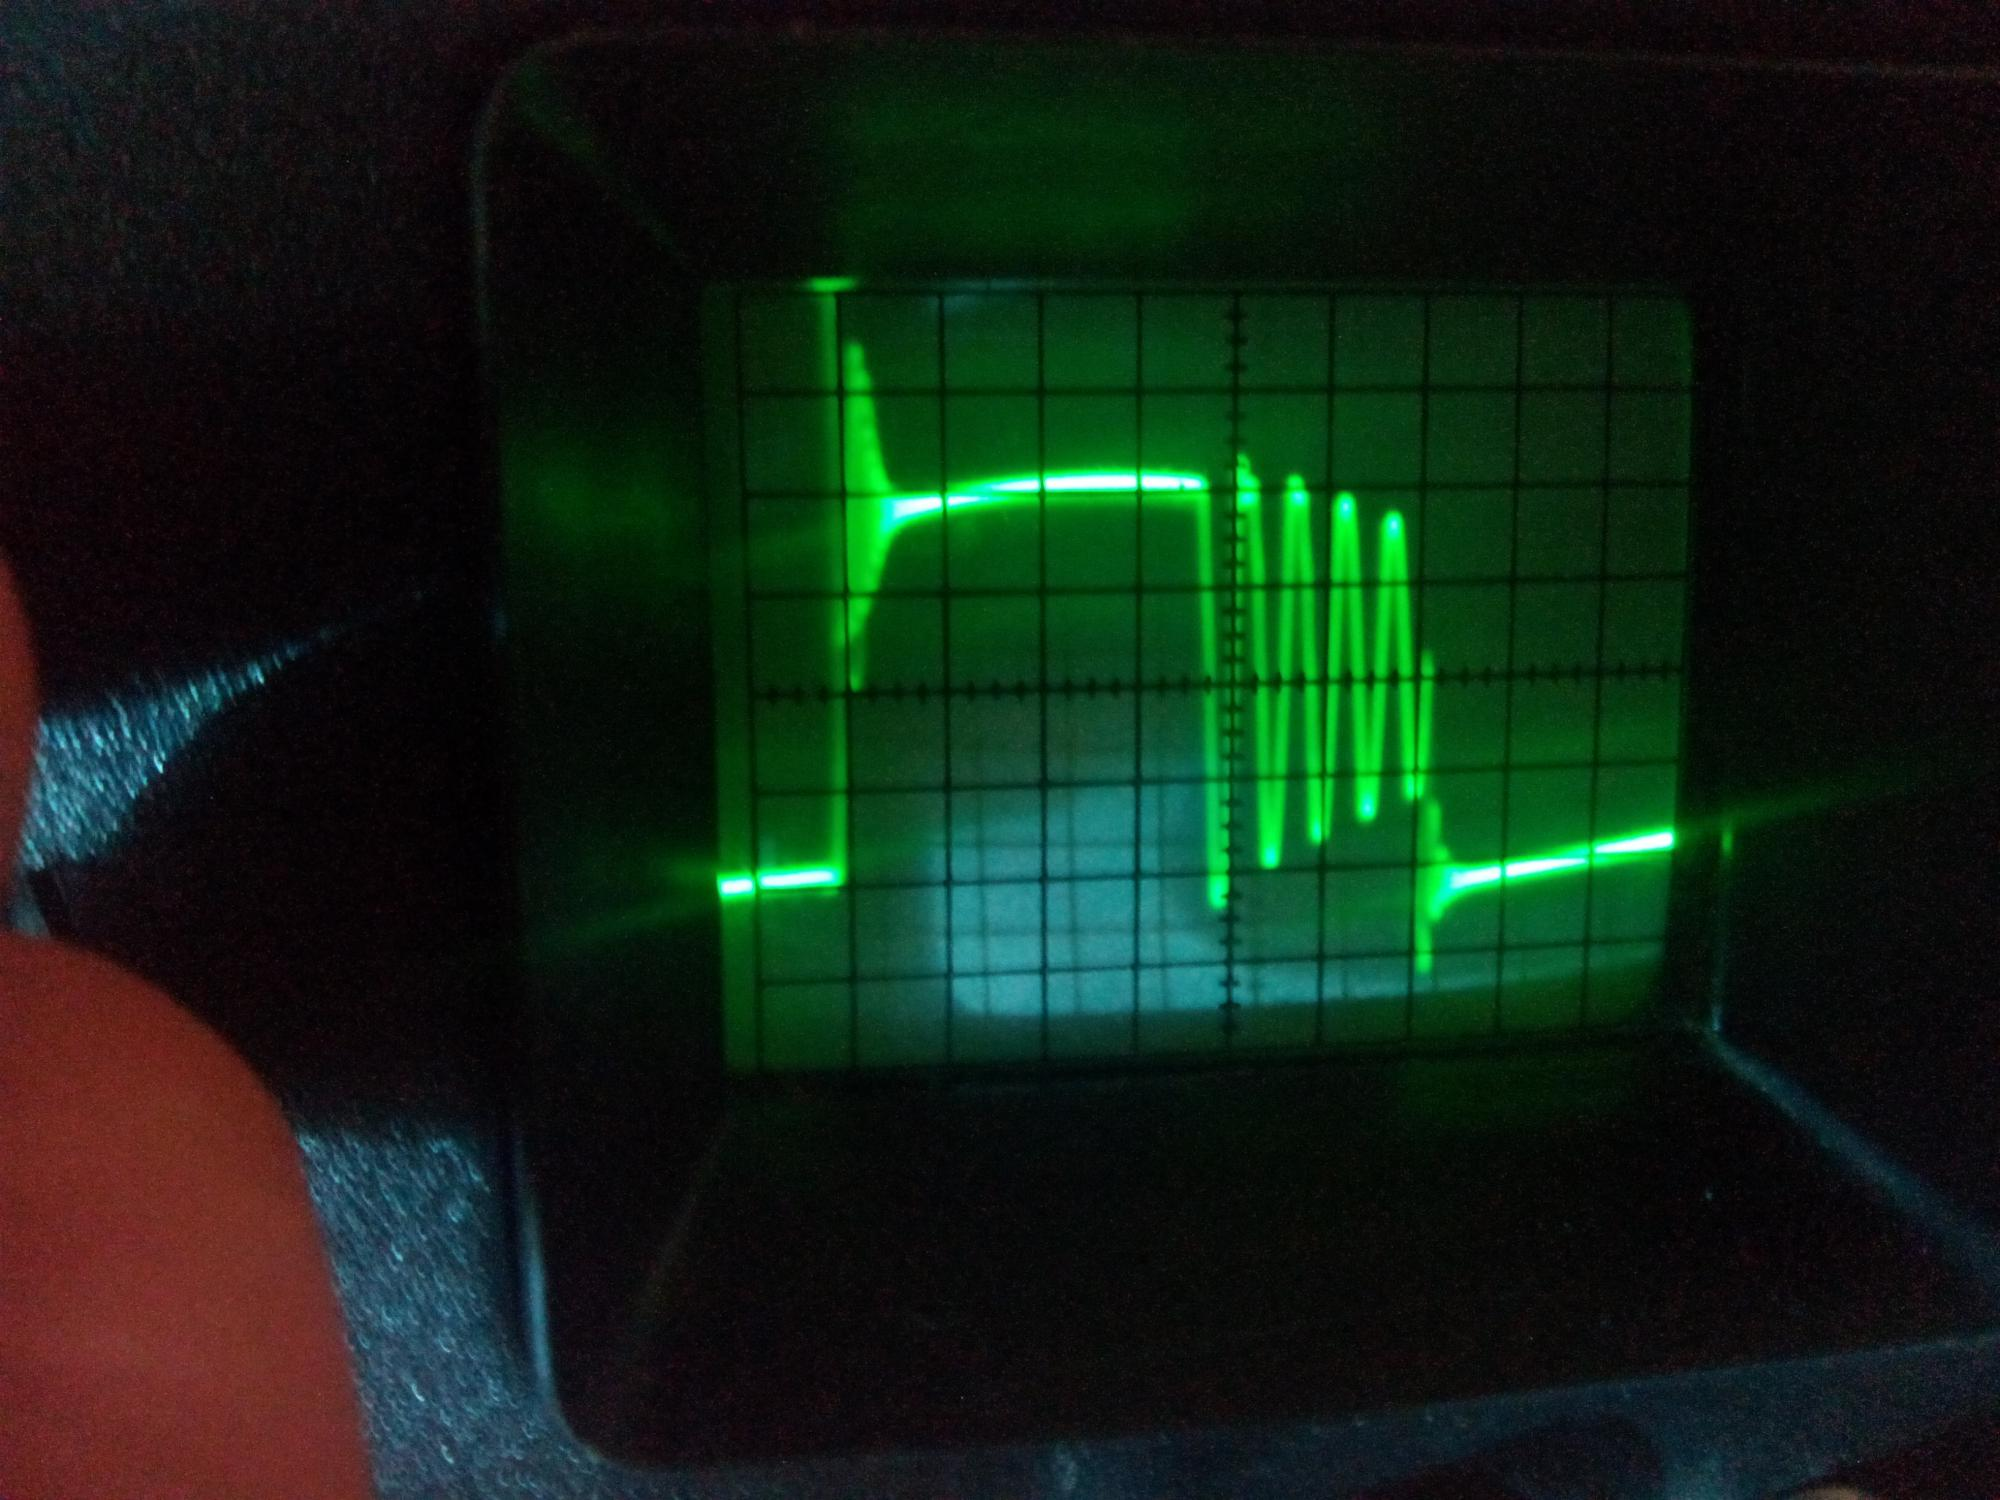 транзистор d209l схема включения